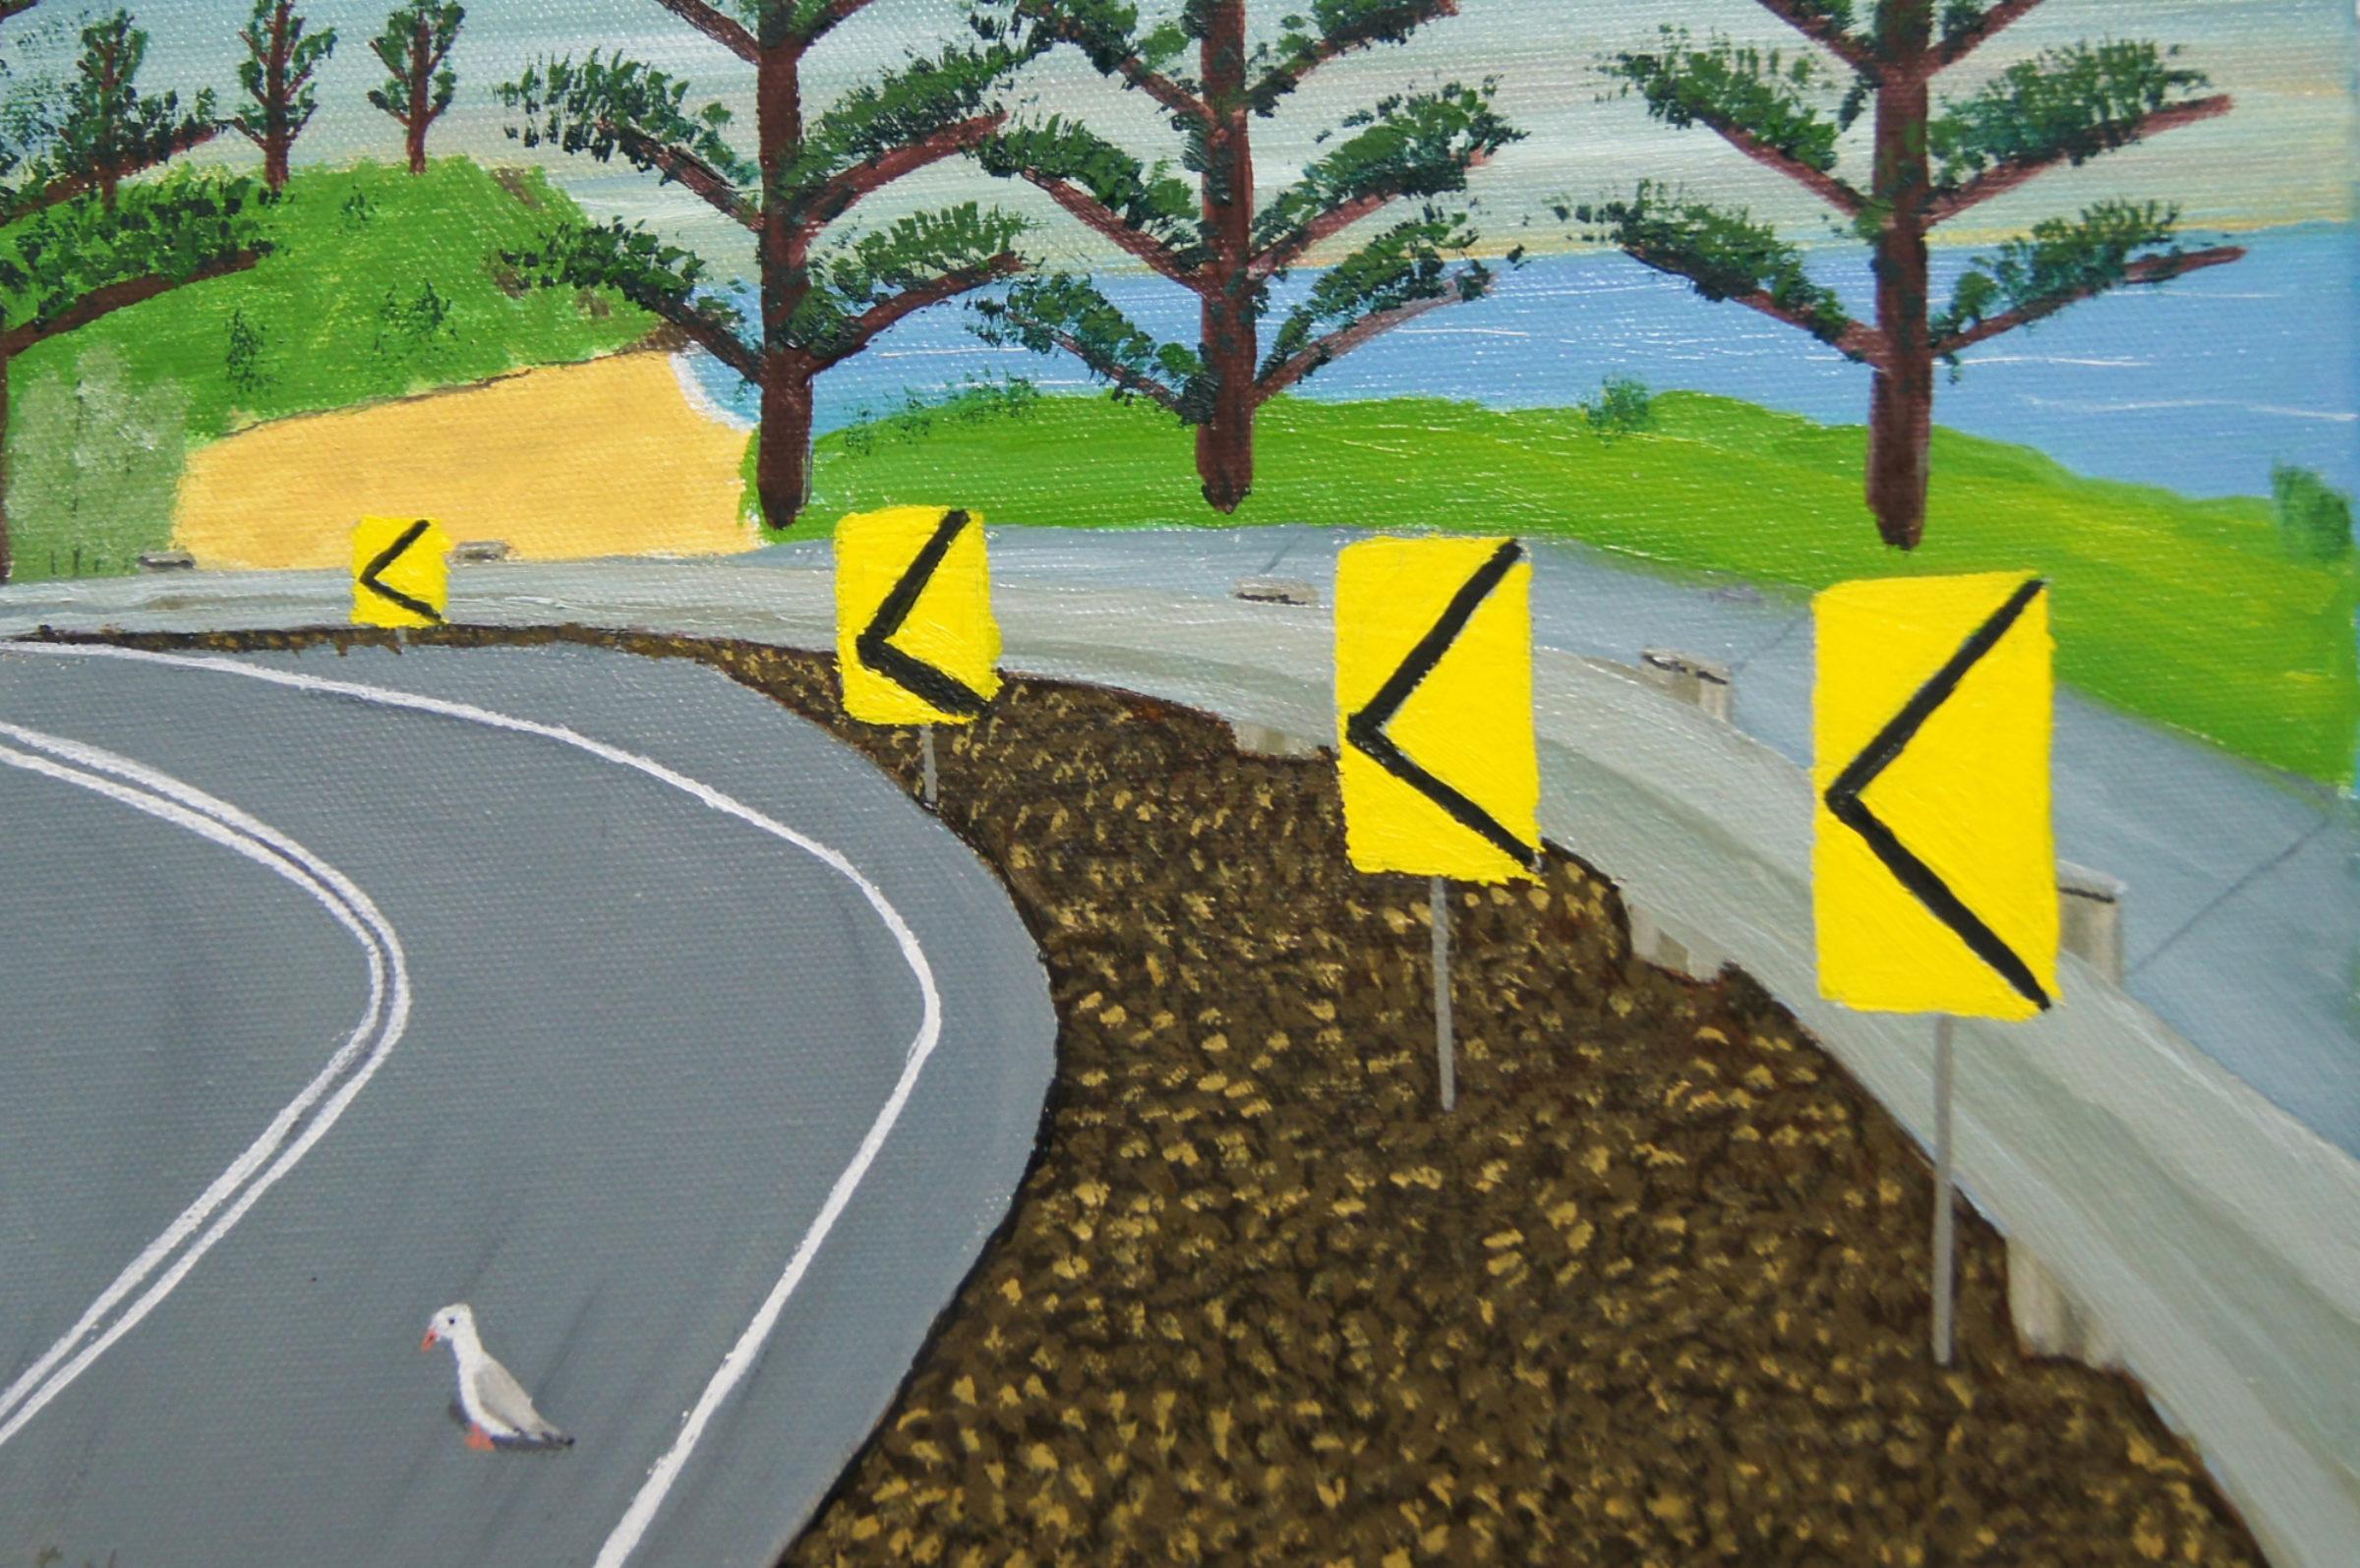 FN_ECG_Seagul-Around-The-Bends_25.5cmx30.5cm_oil-on-canvas